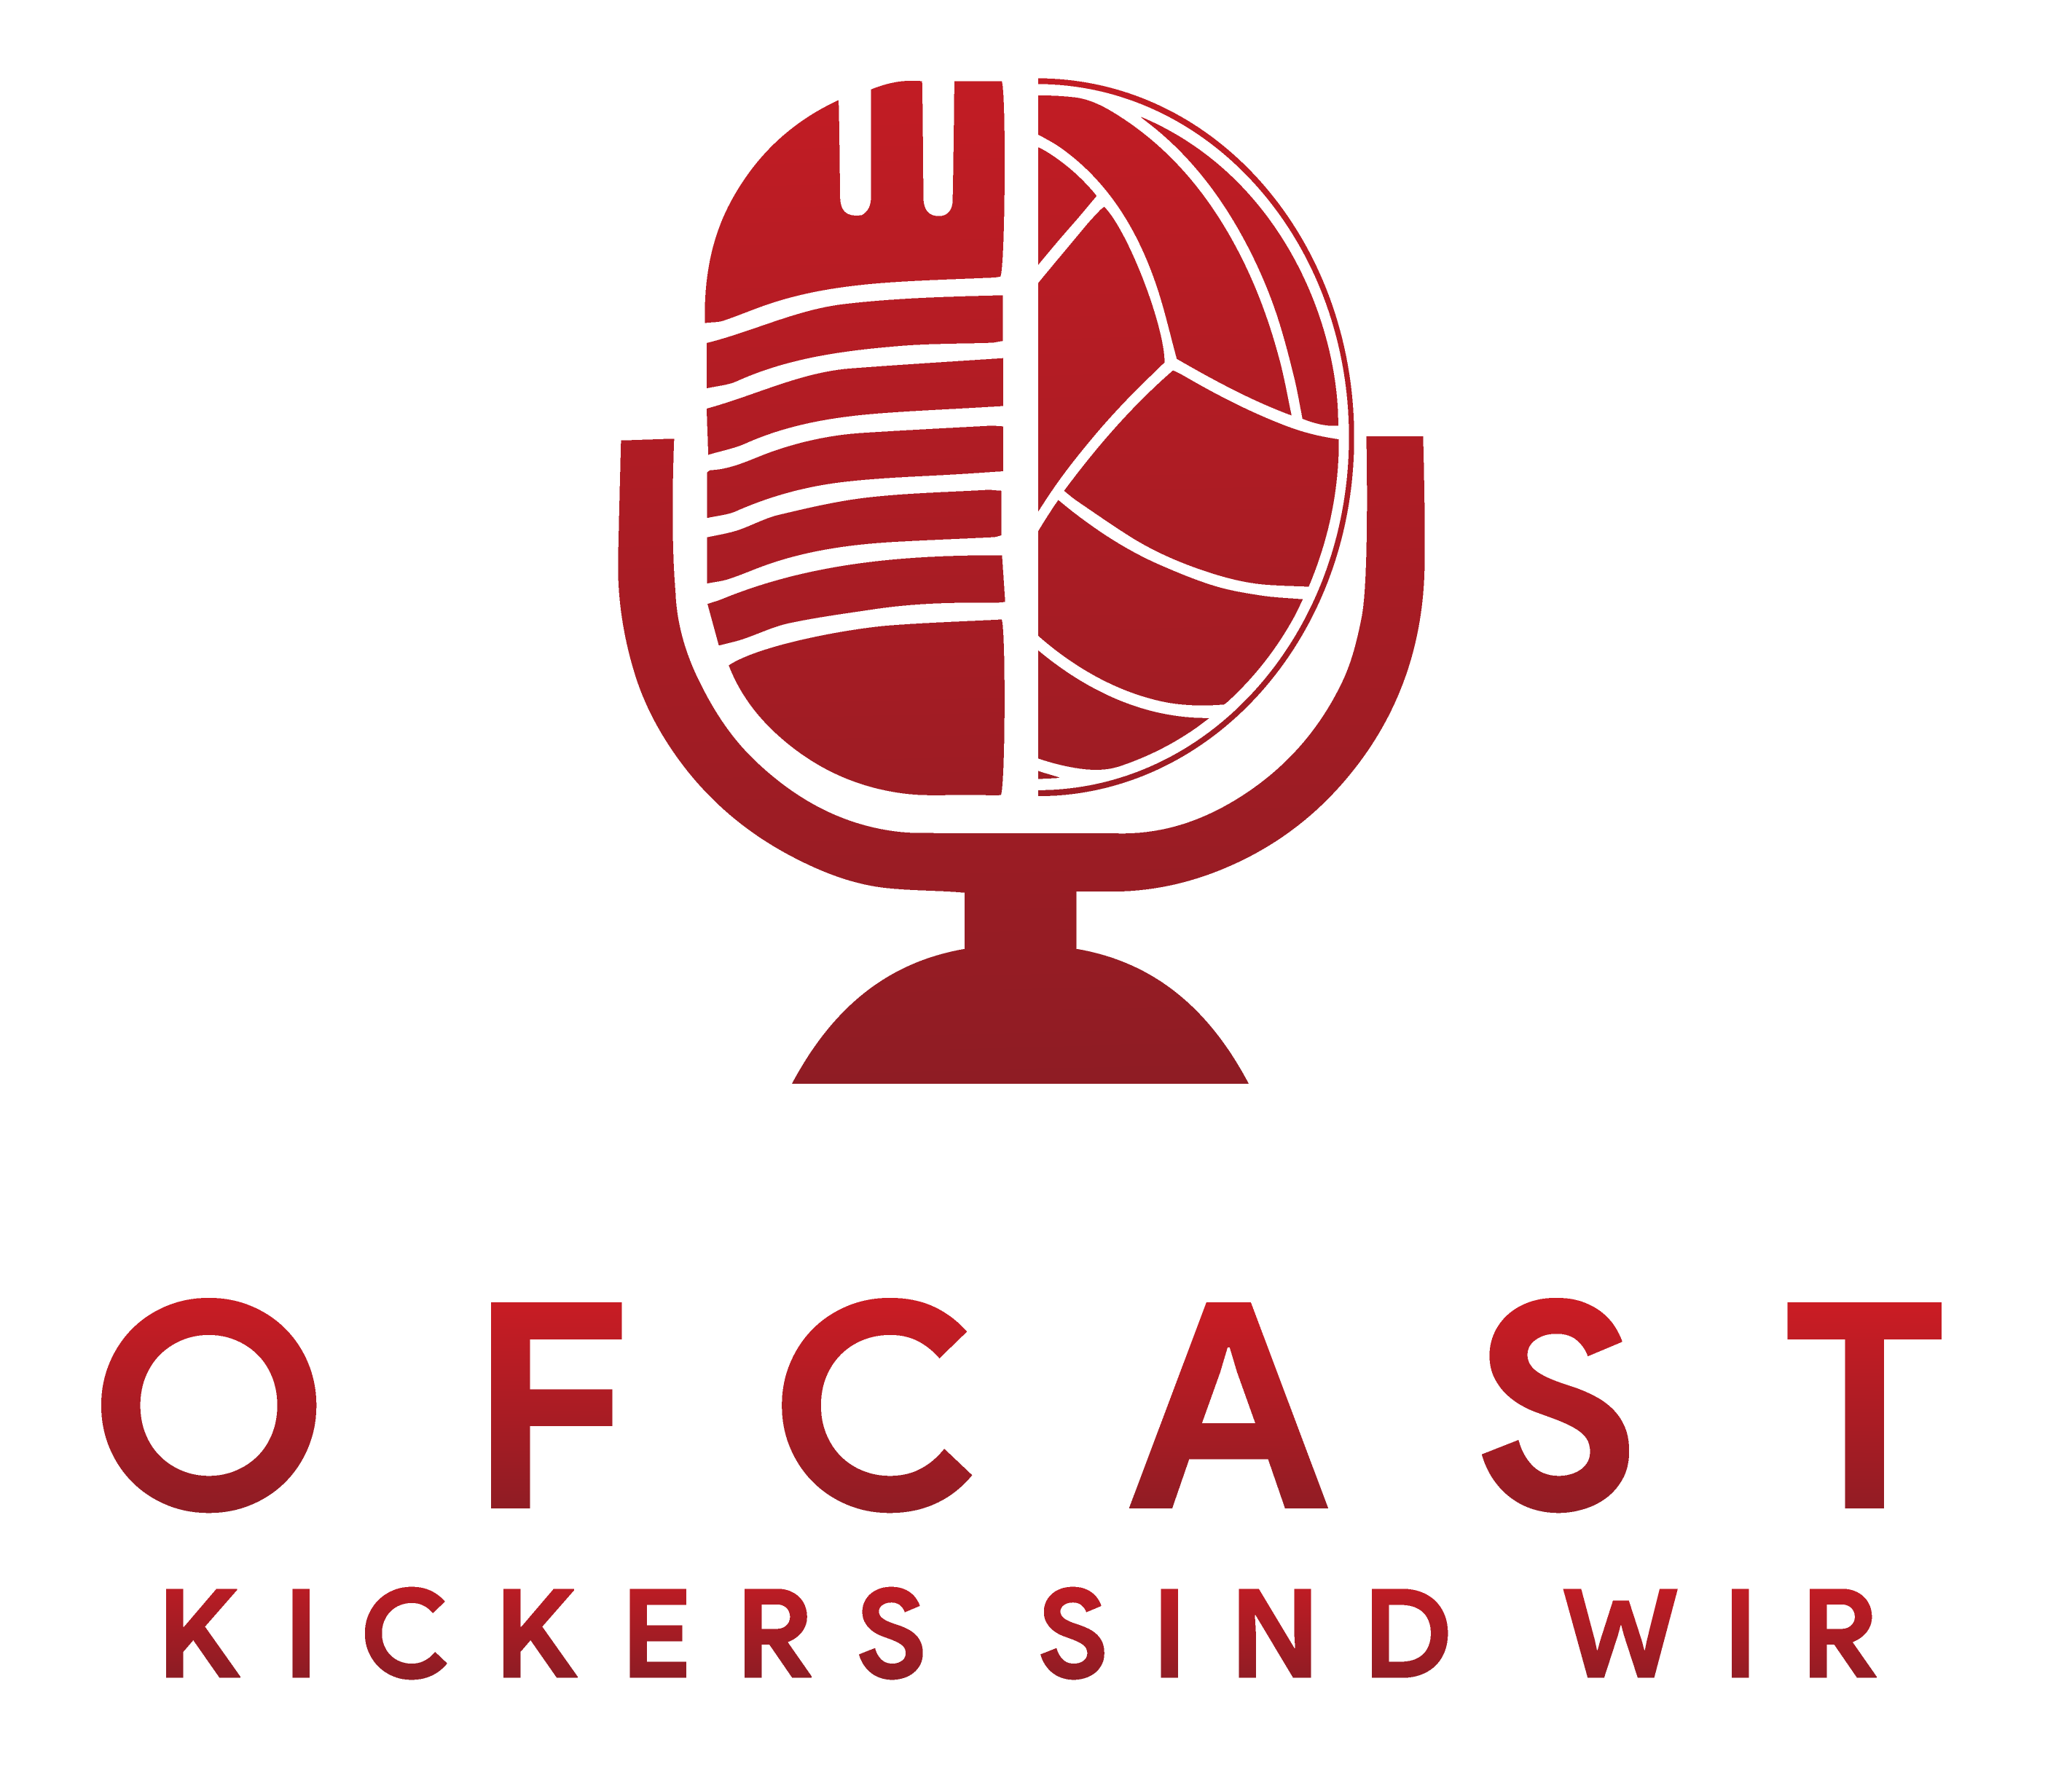 OFCast - Kickers sind wir